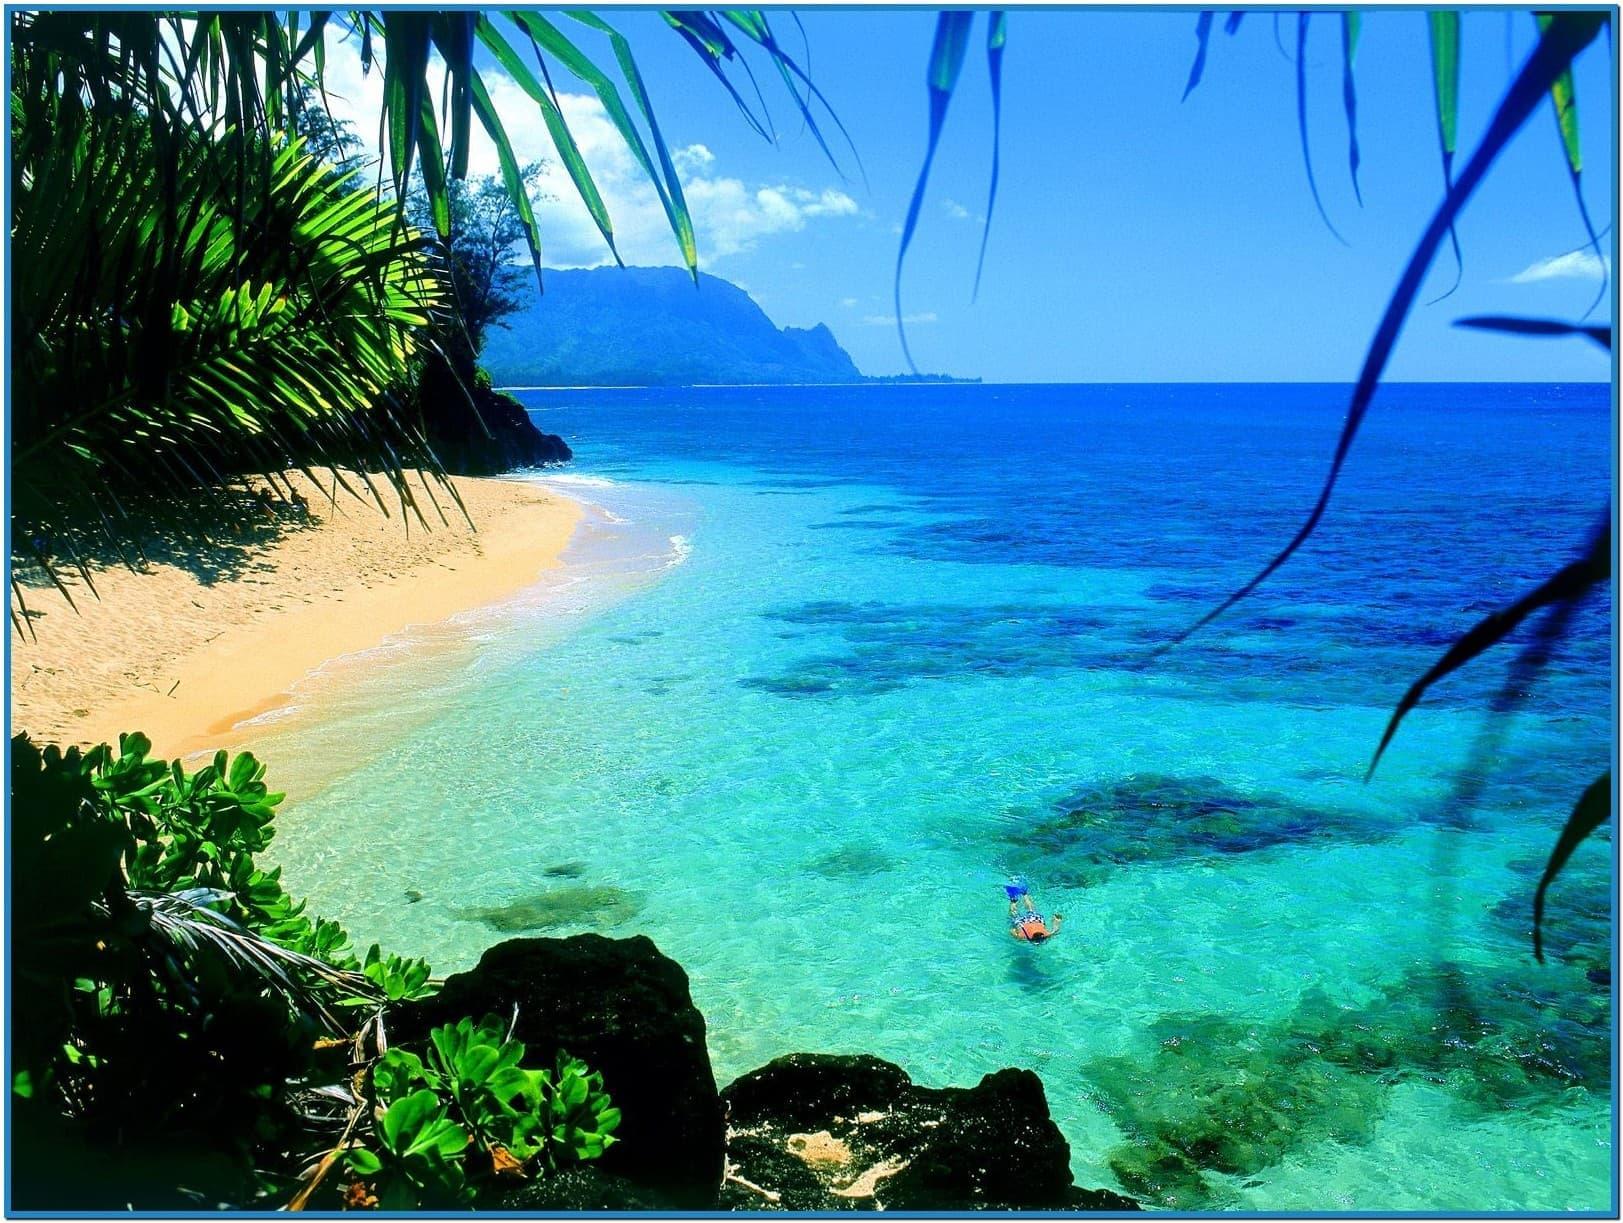 44] Hawaii Wallpaper Screensavers on WallpaperSafari 1623x1223